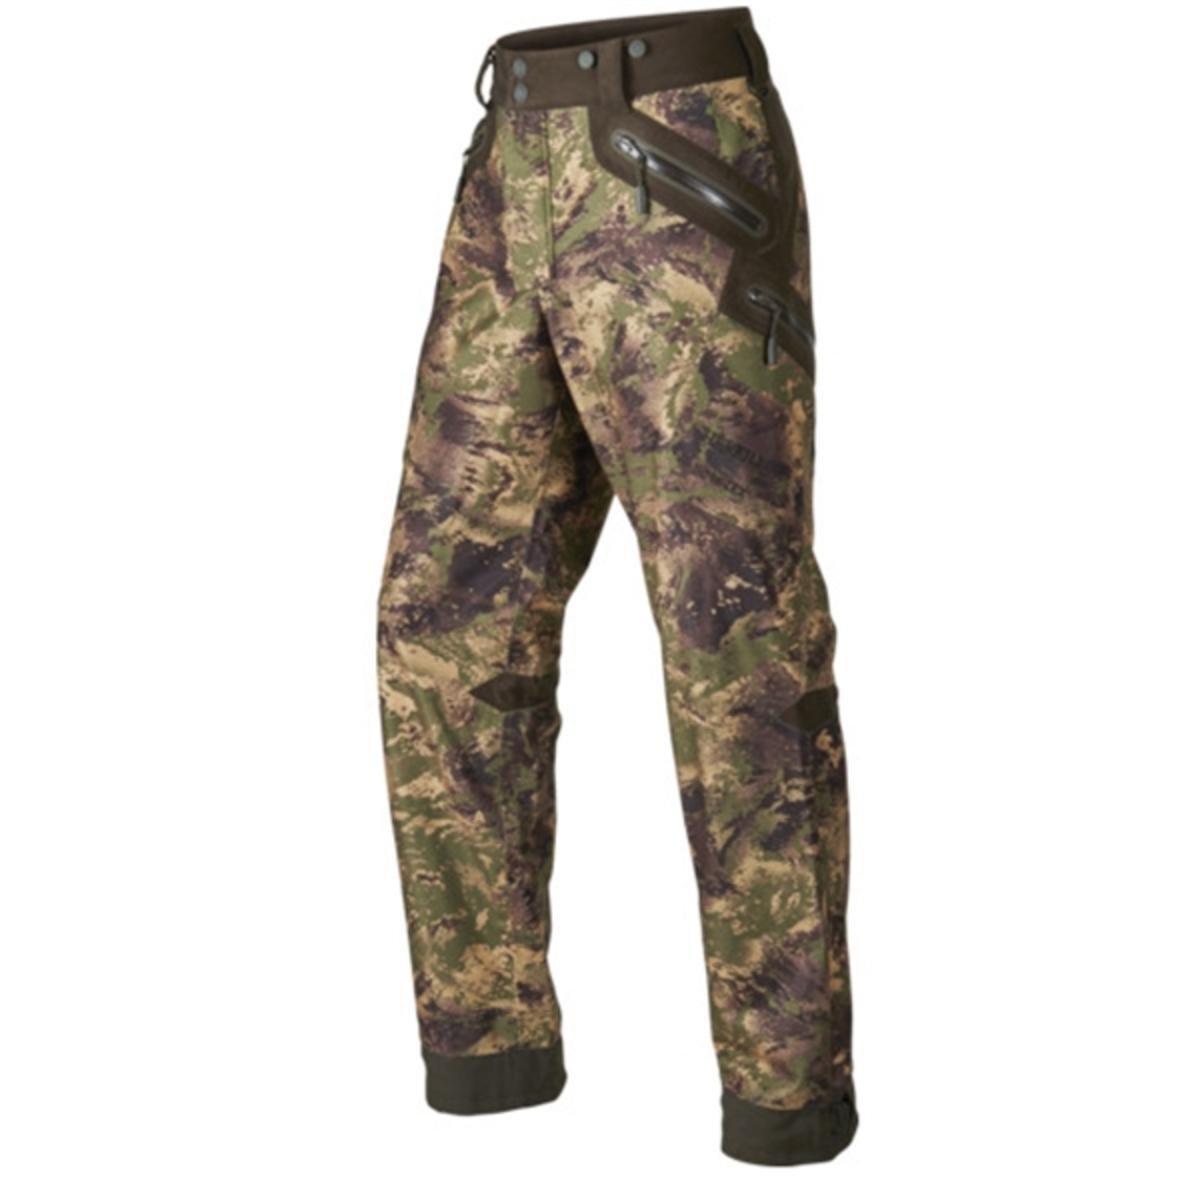 Harkila Infiltration Pantalon Axis MSP Vert forêt